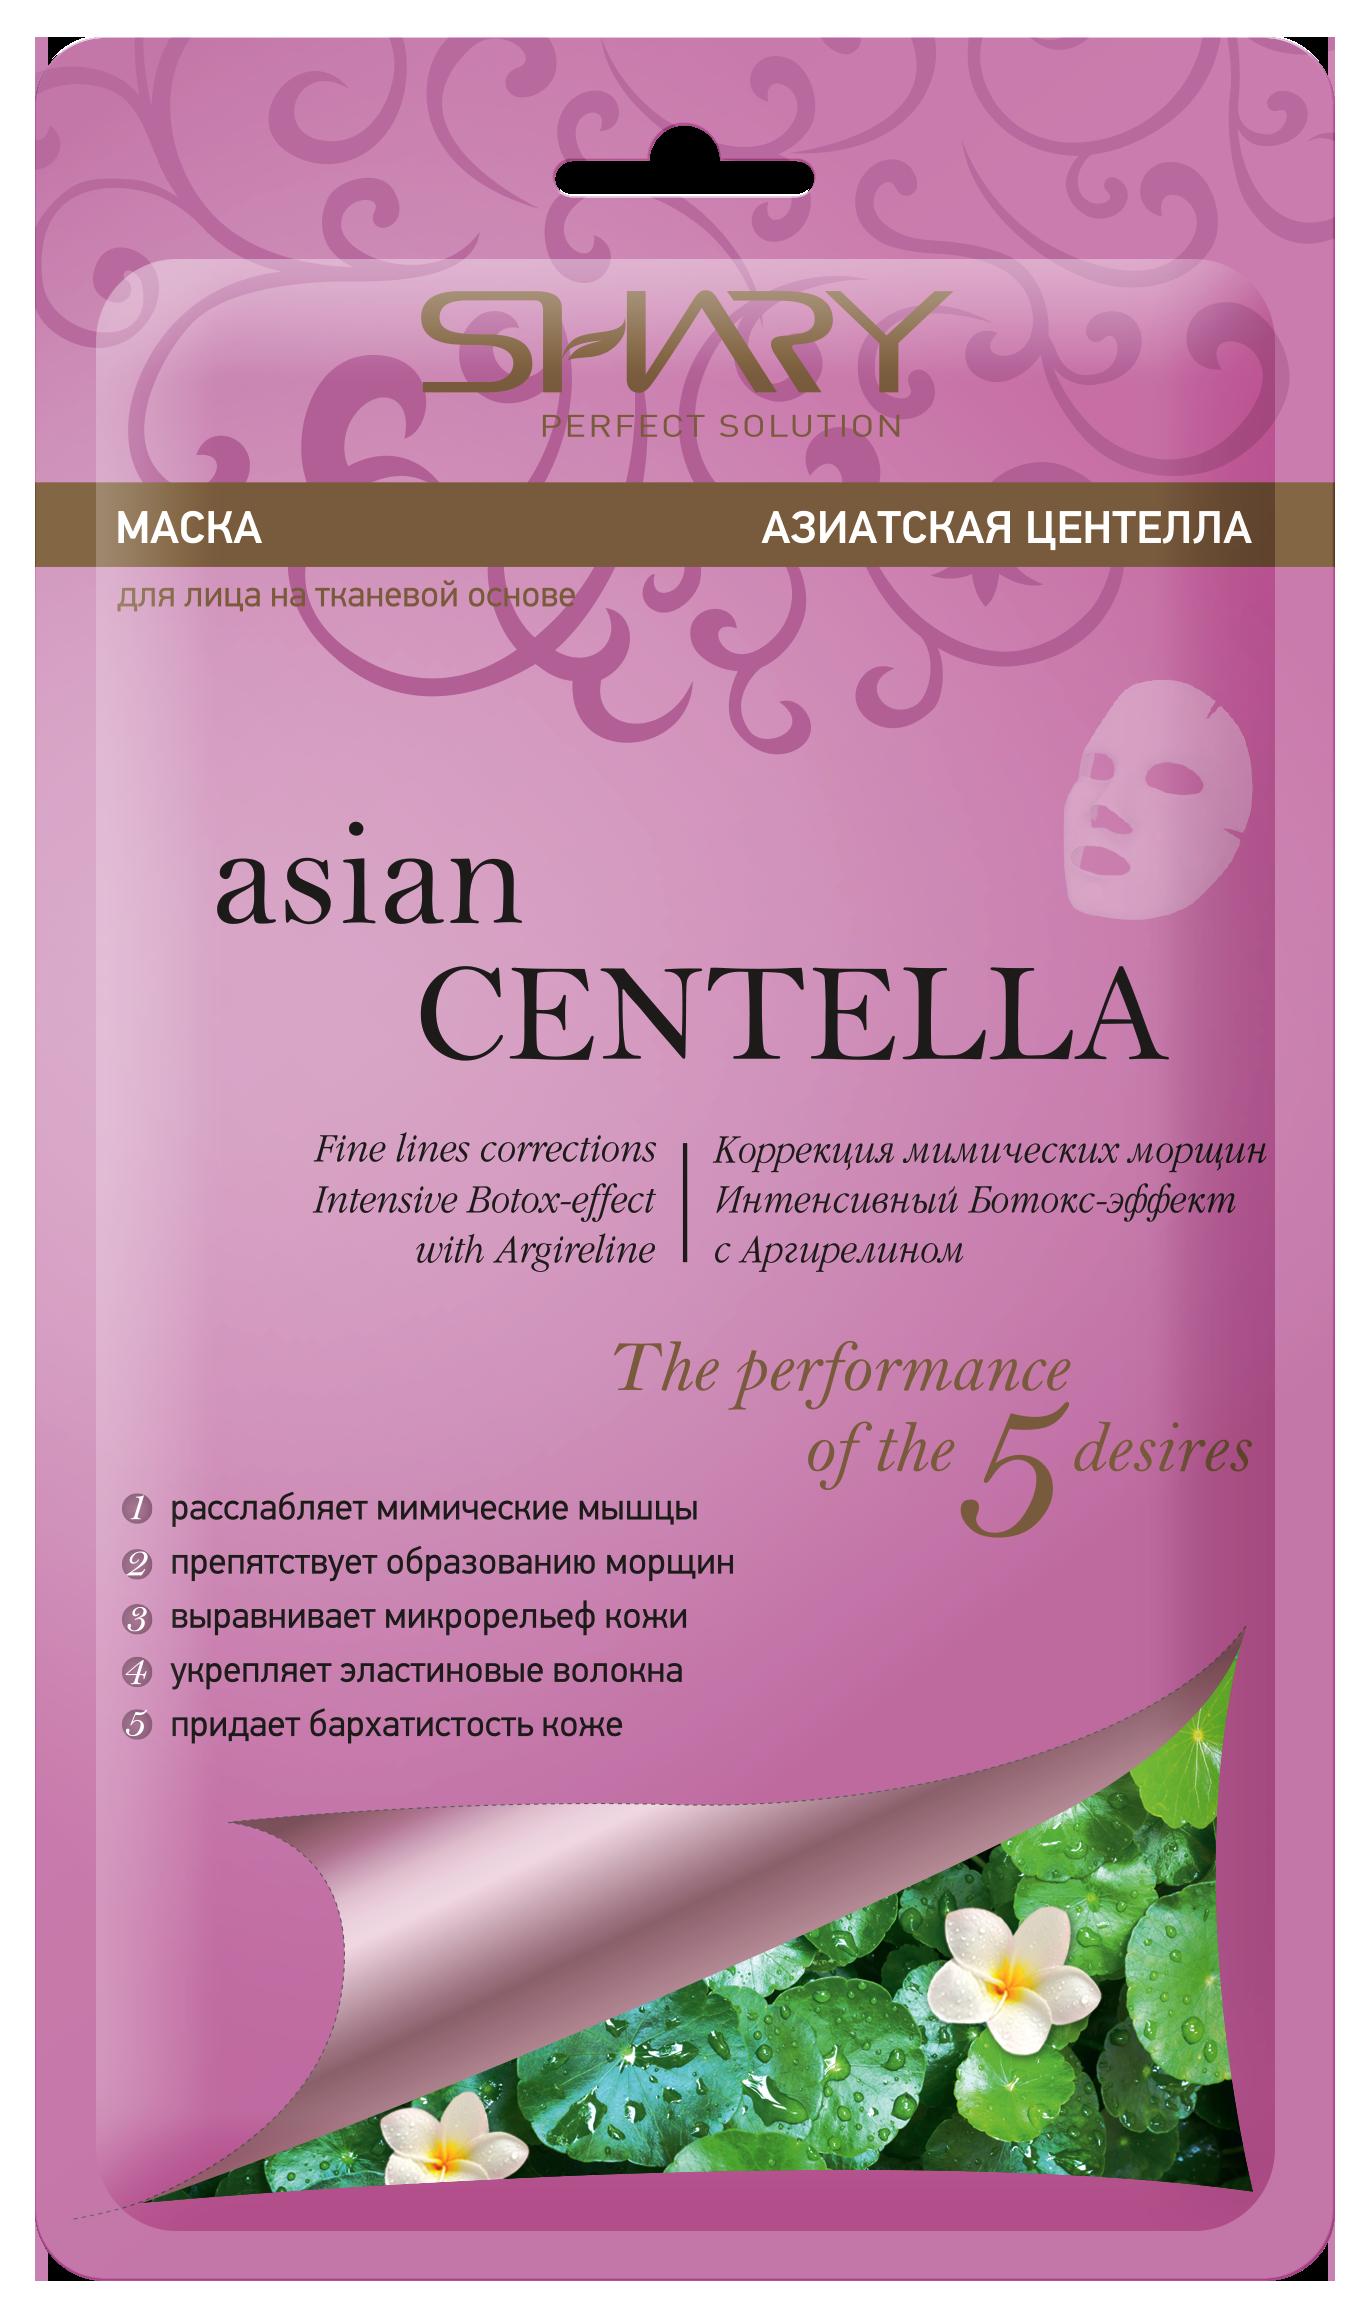 SHARY Маска для лица на тканевой основеАзиатская центелла / SHARY 20 гр